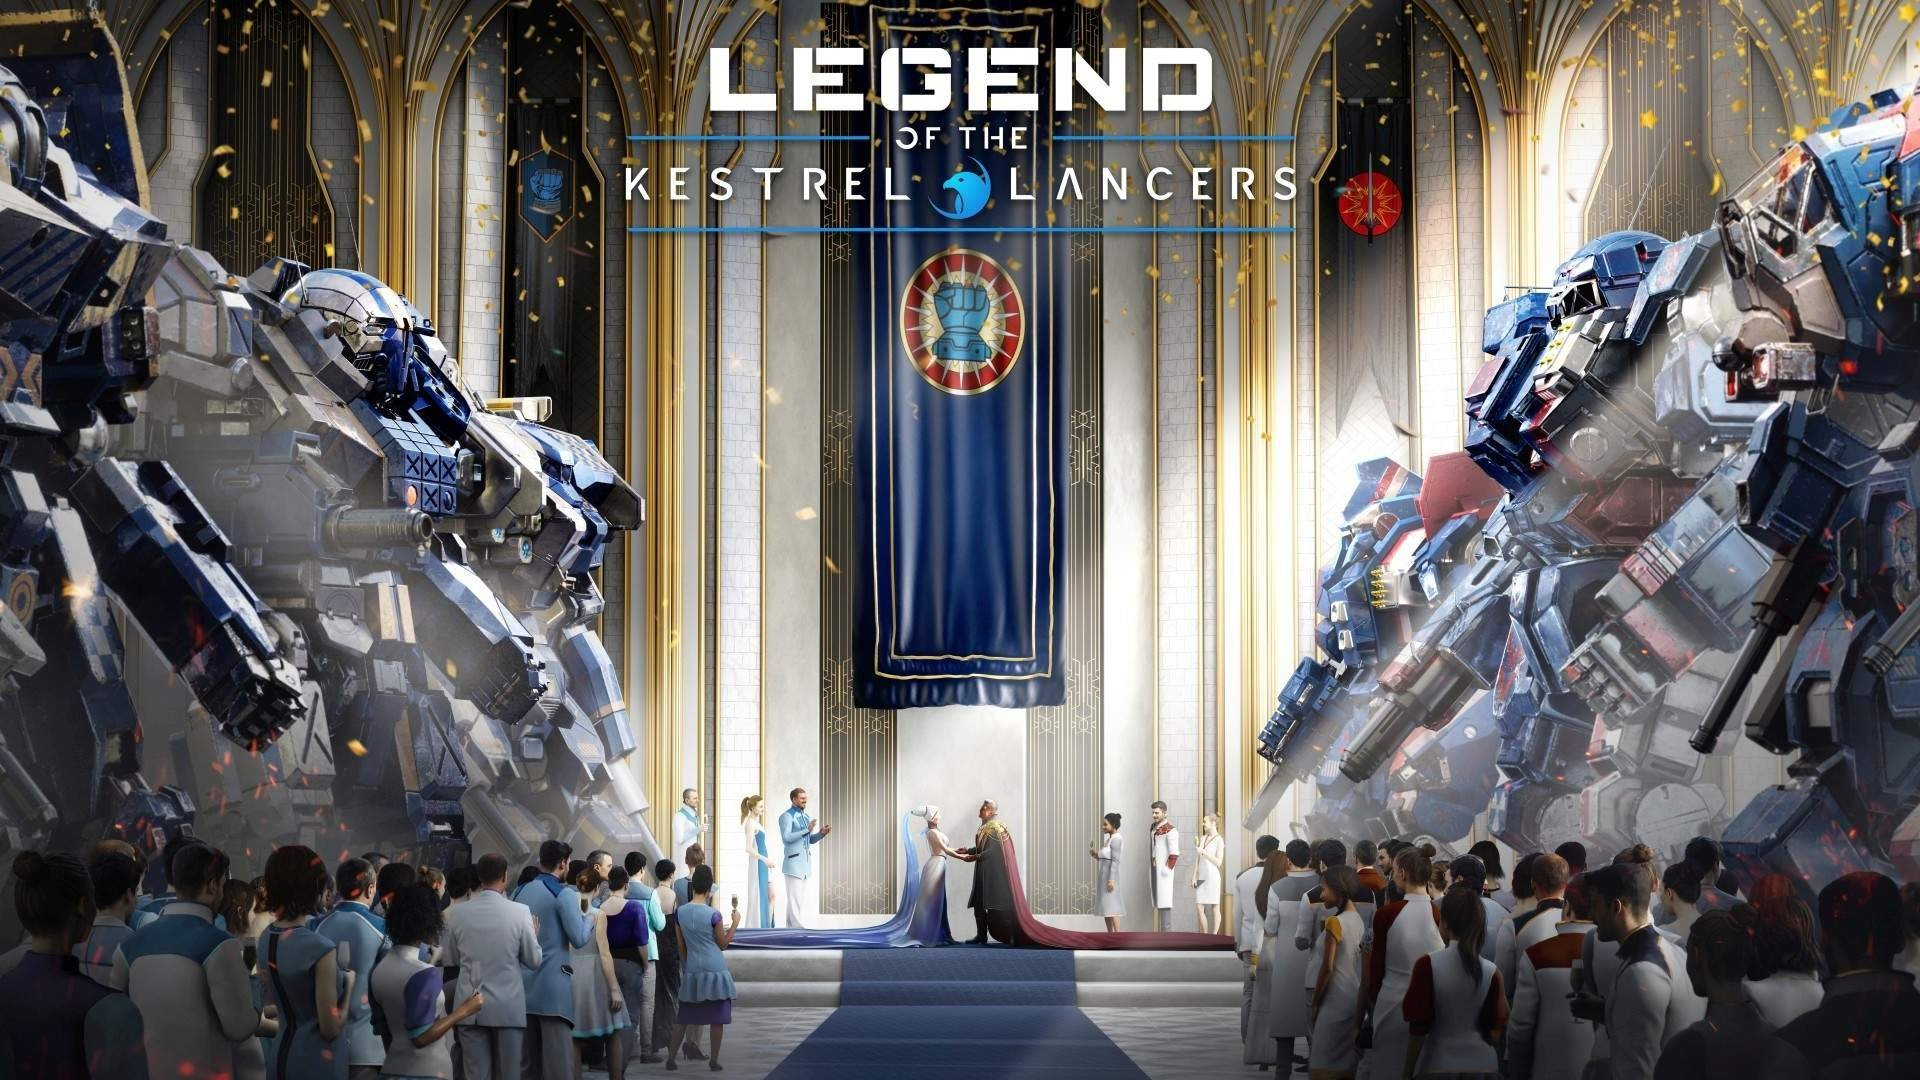 MechWarrior 5: Legend of the Kestrel Lancers Launches September 23rd